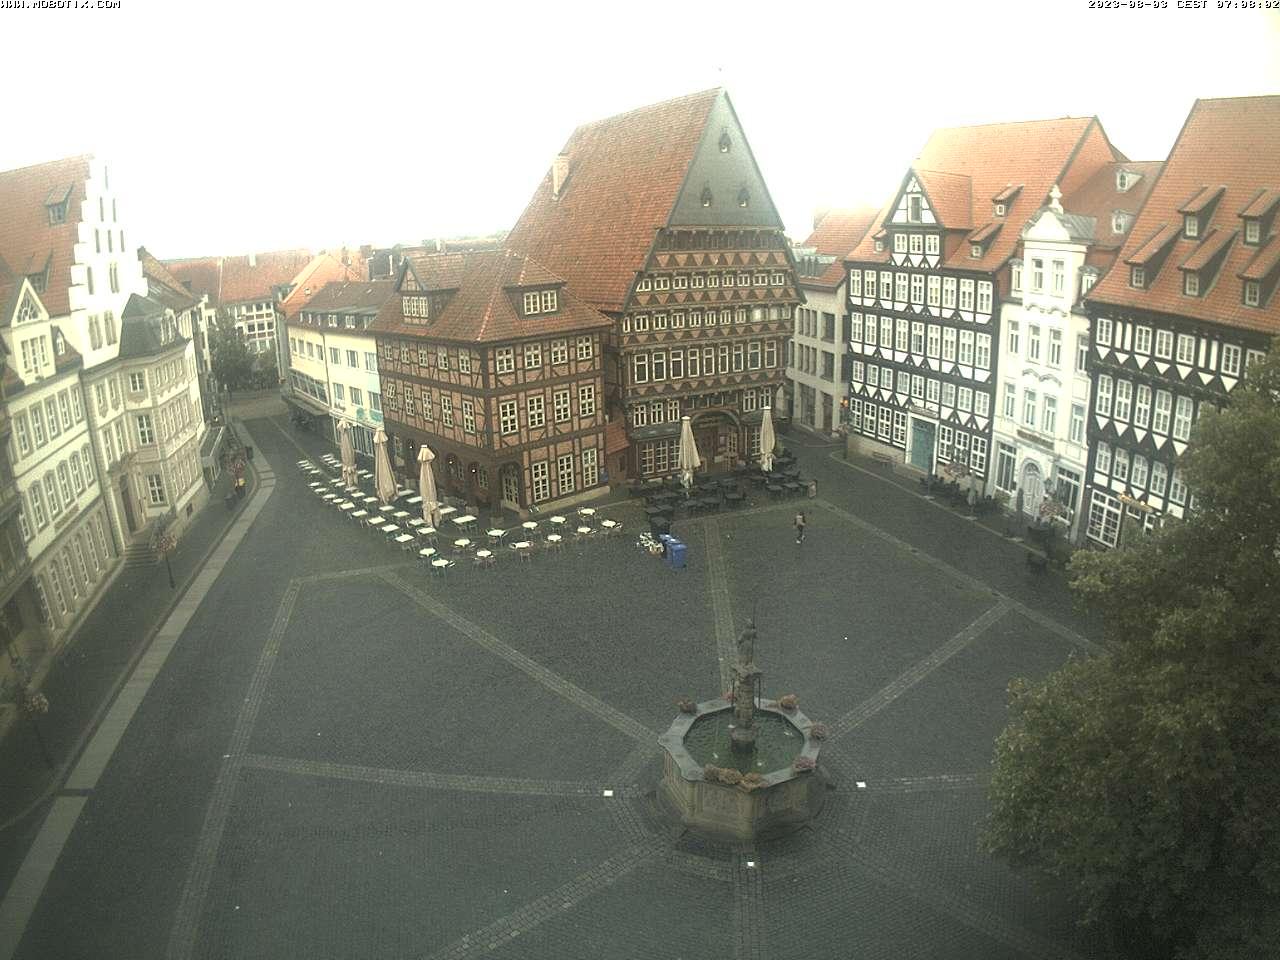 Hildesheim Tue. 07:09